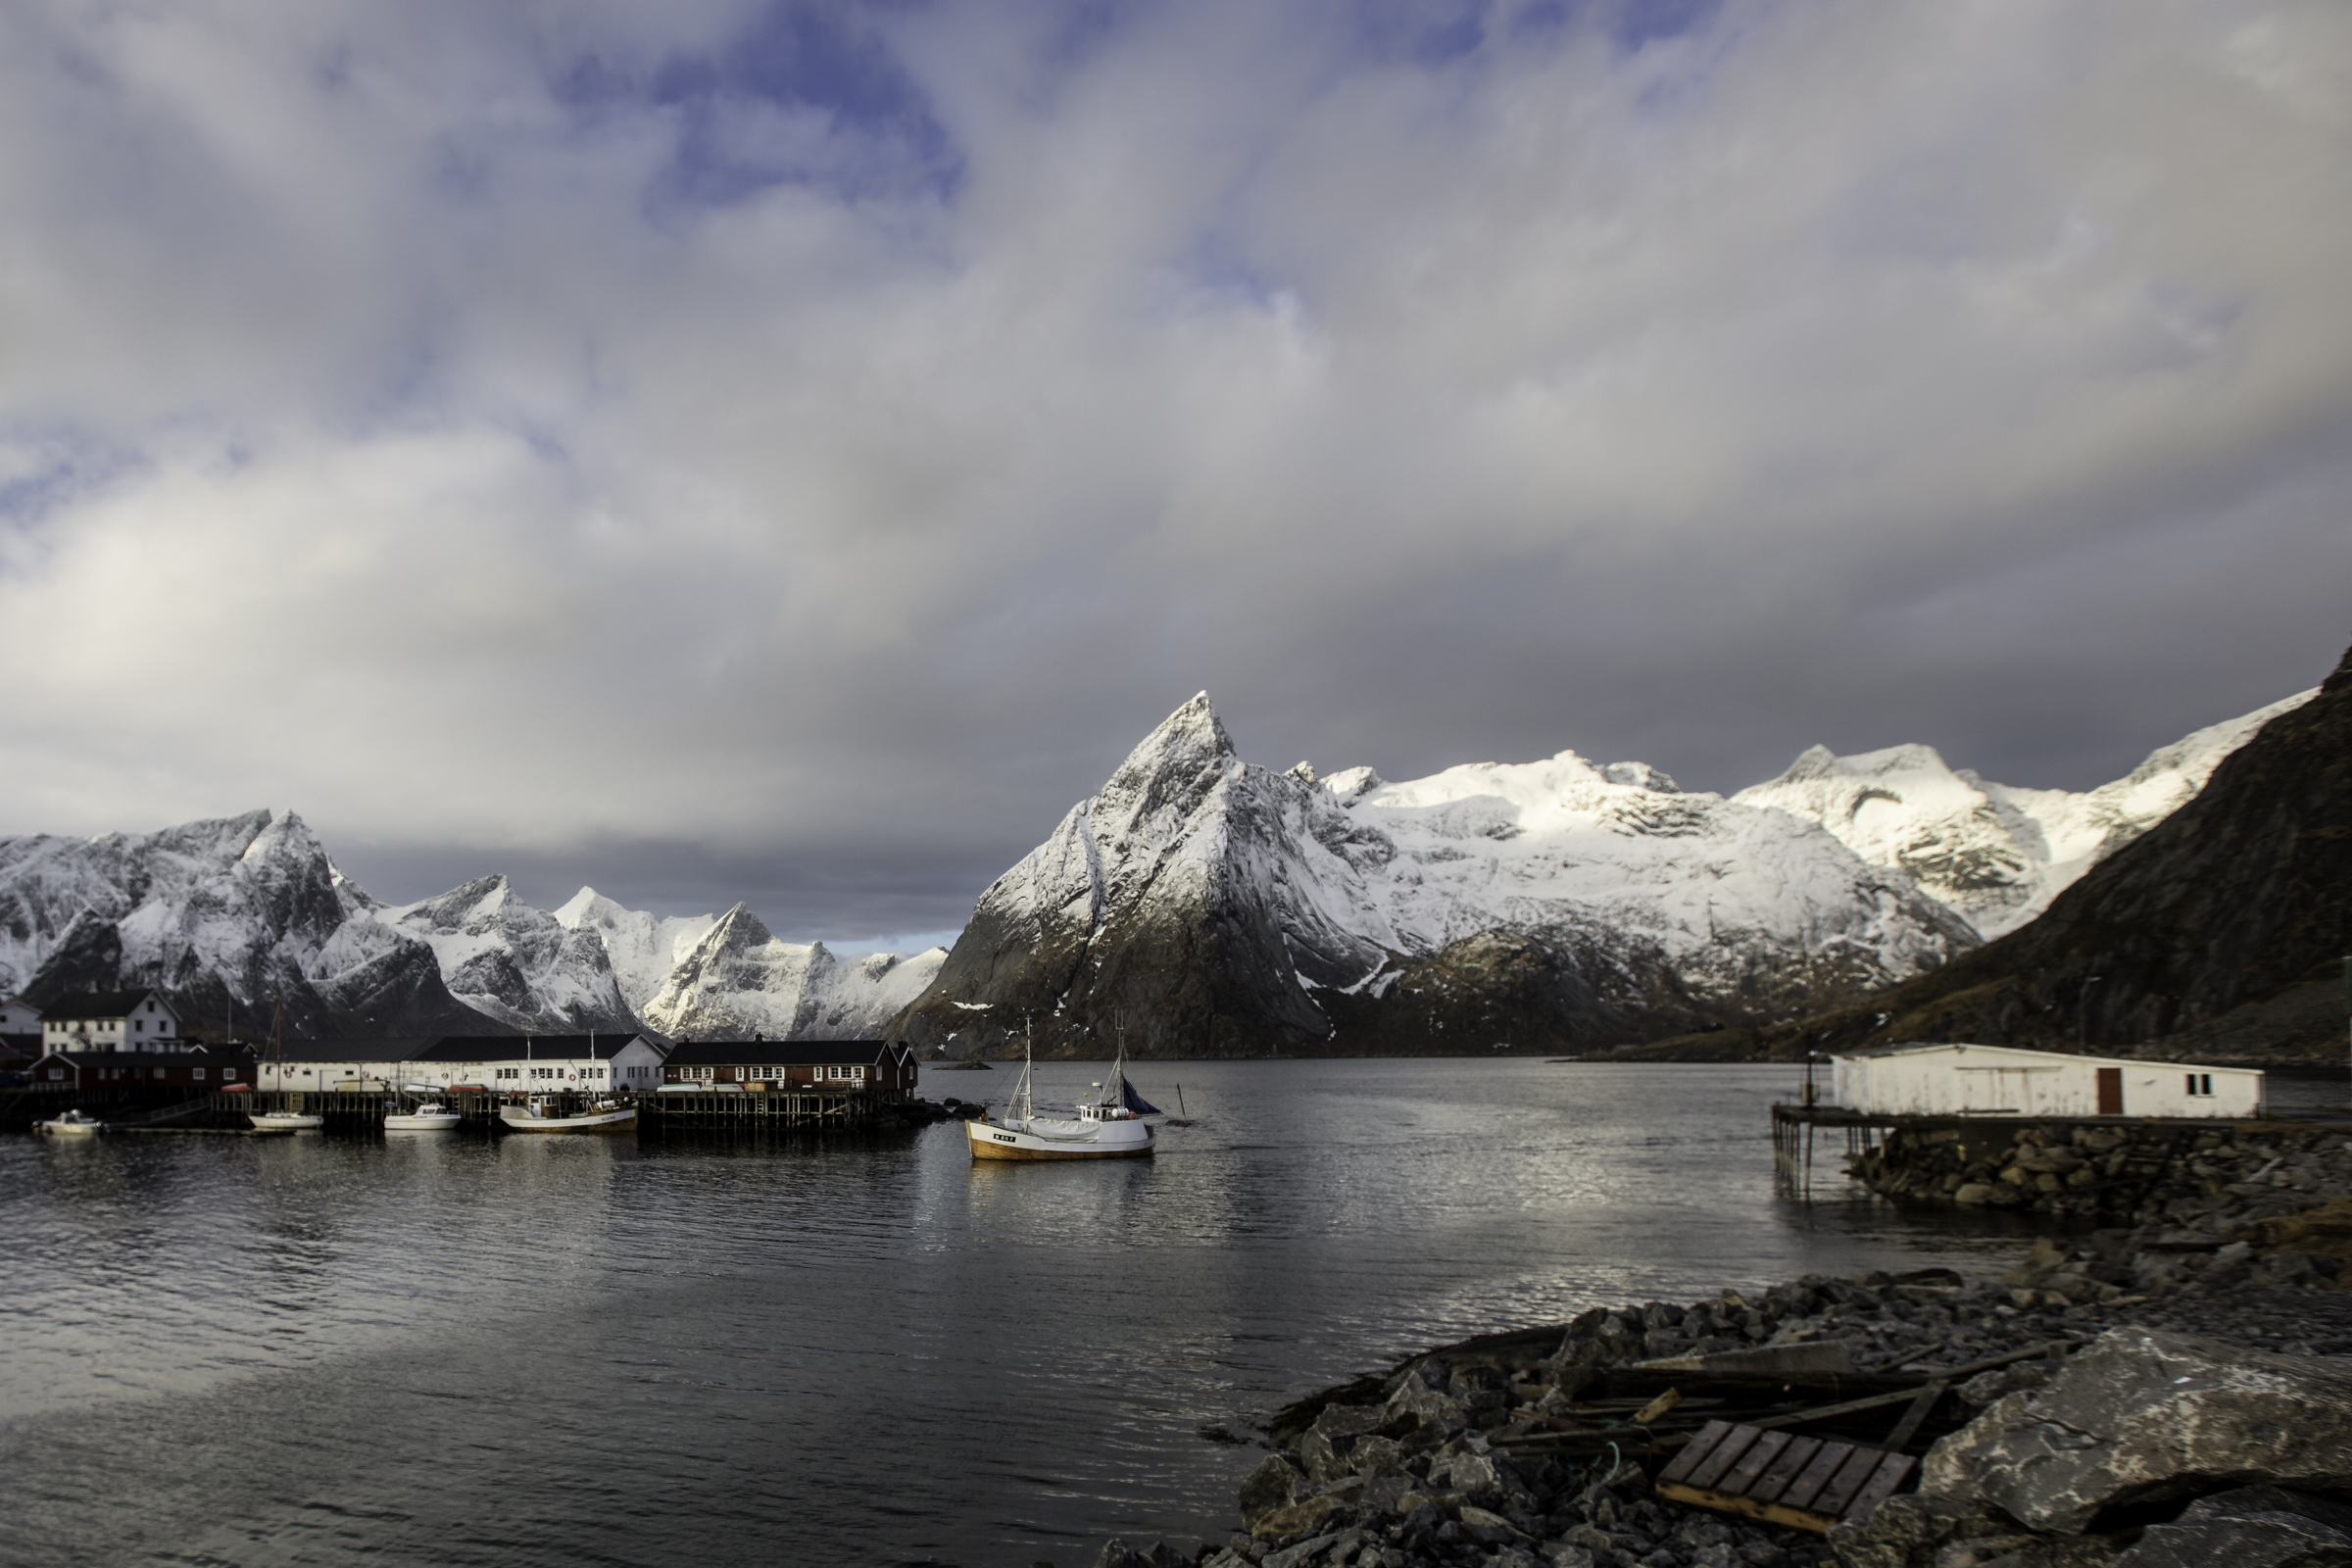 TKeyes_TKeyes_Norway~0303.jpg